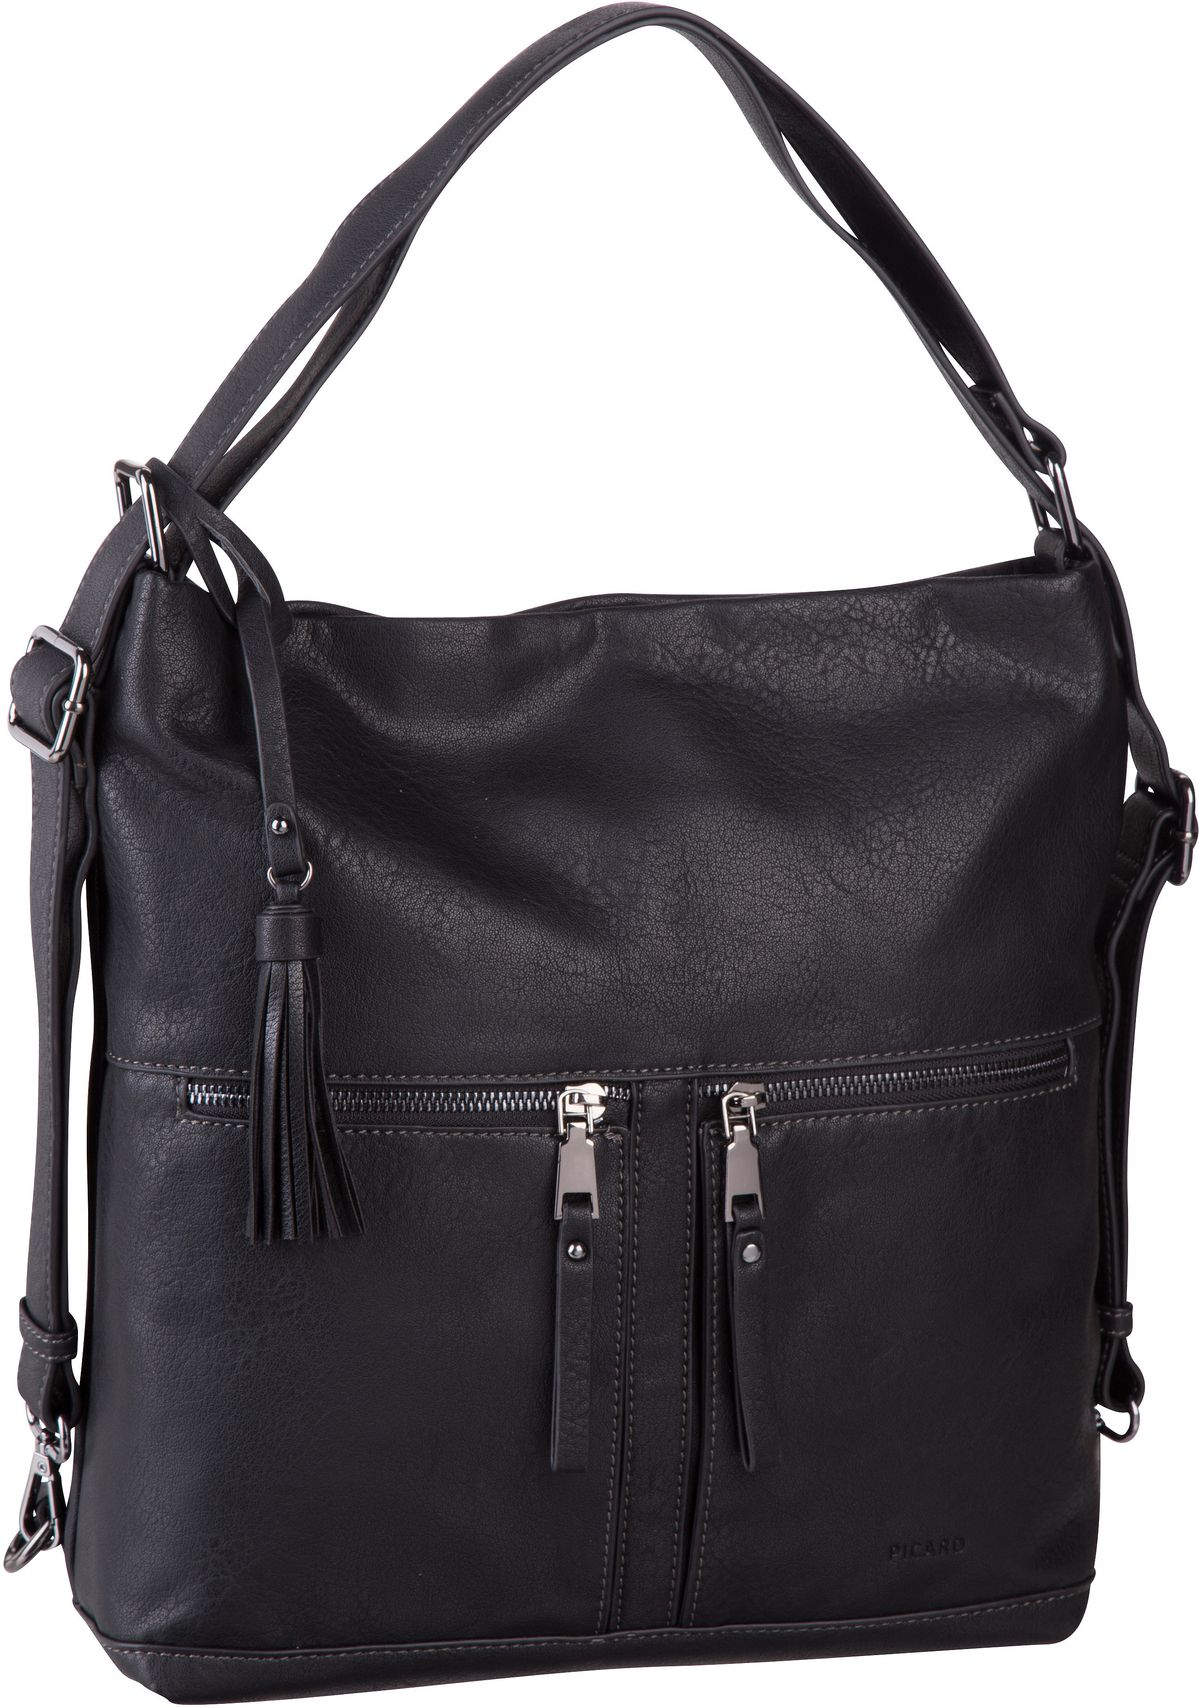 Handtasche Mellow 2745 Schwarz